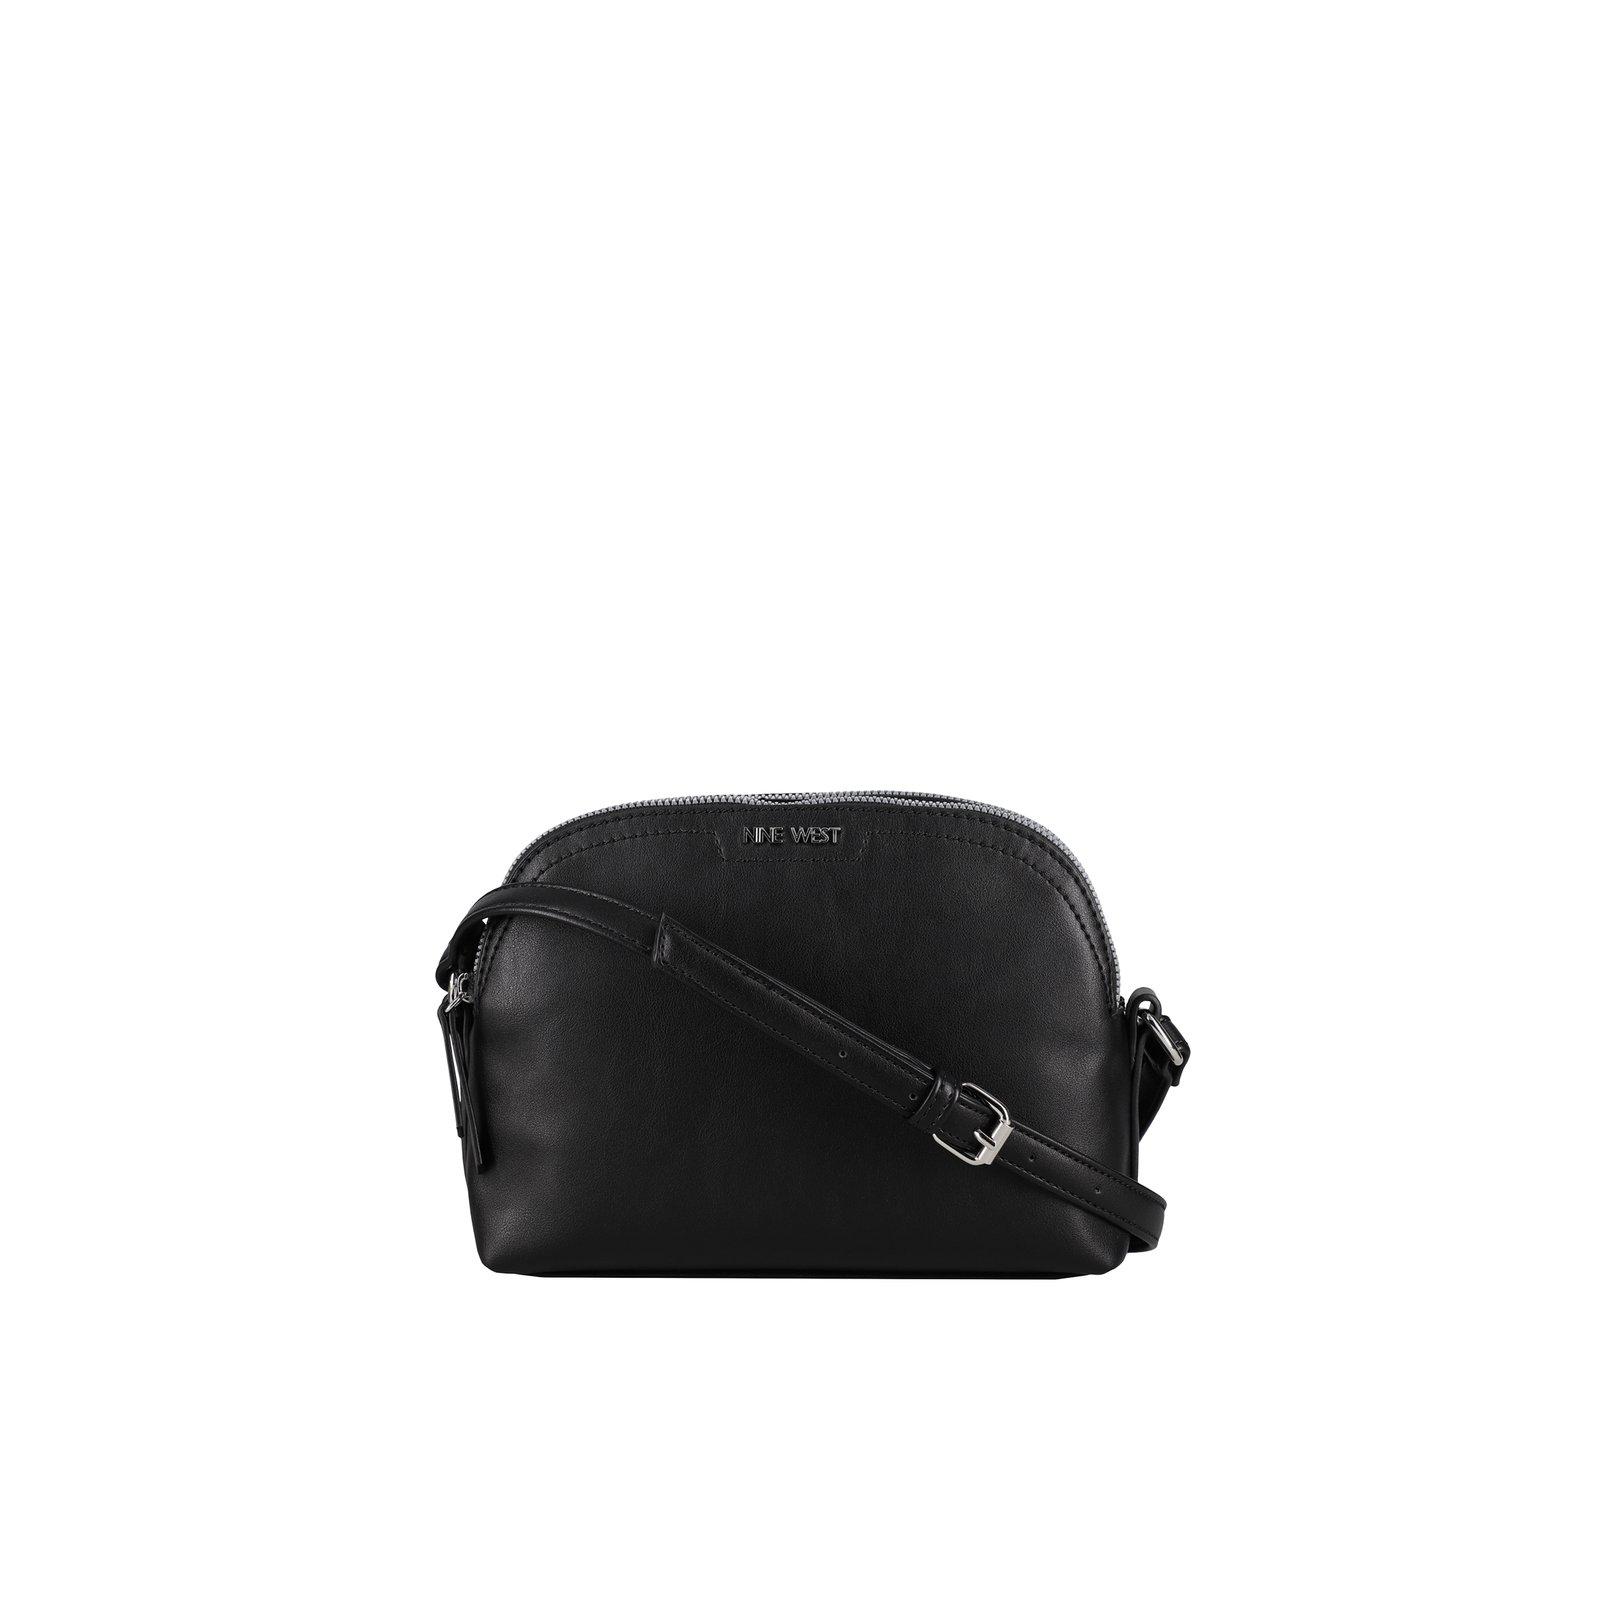 Nine West Onusta - Women's Handbags - Black photo